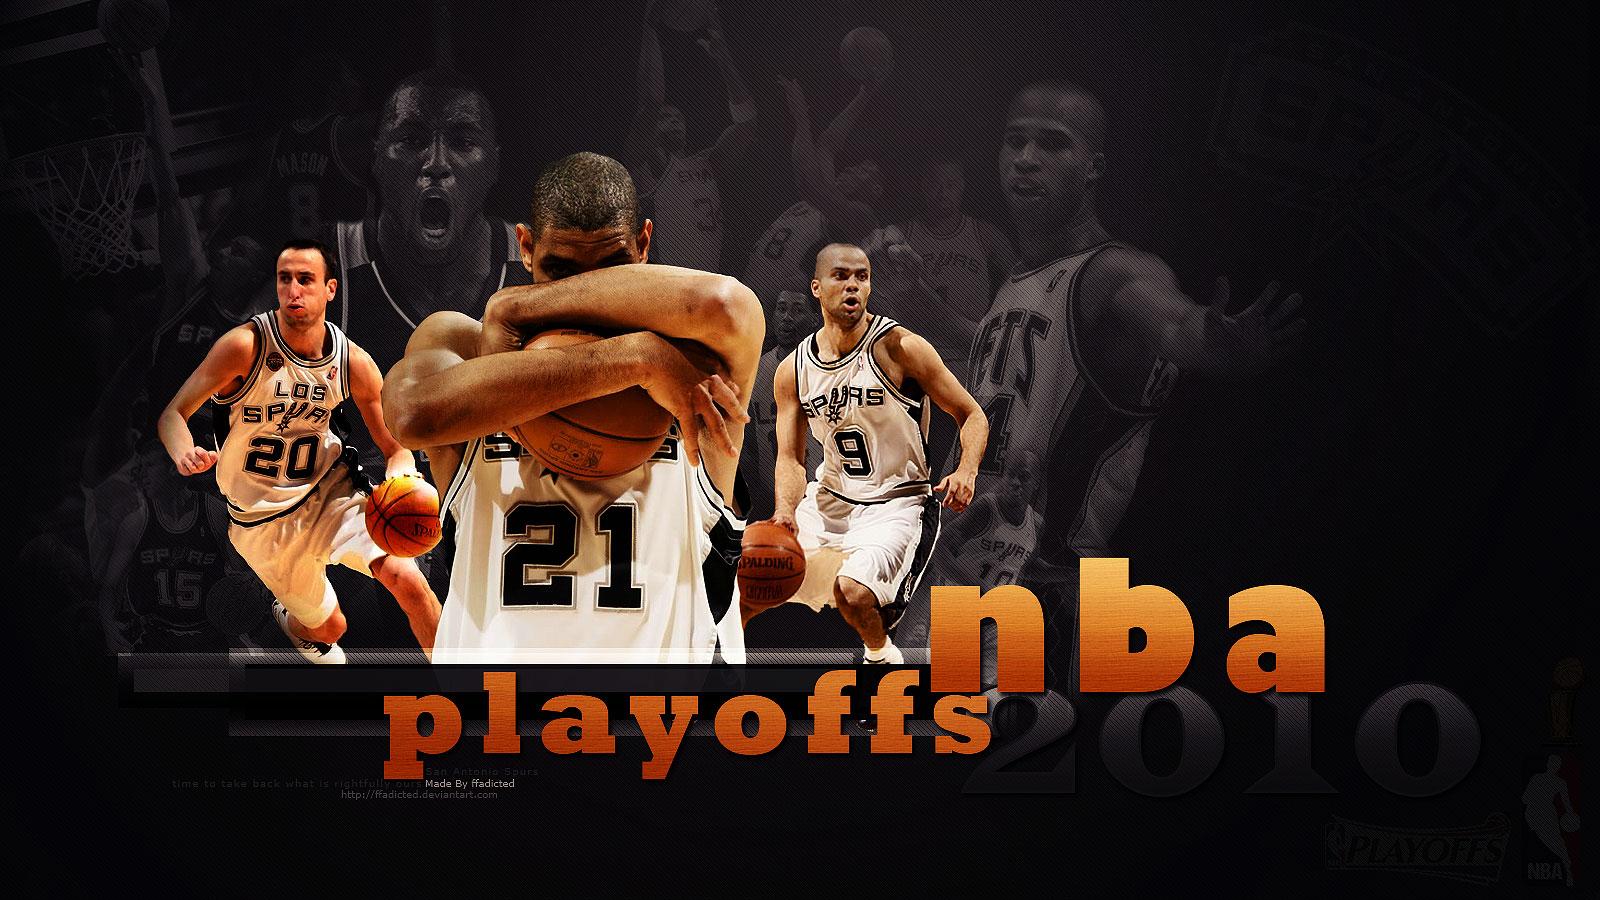 2013 San Antonio Spurs NBA Wallpaper ImageBankbiz 1600x900